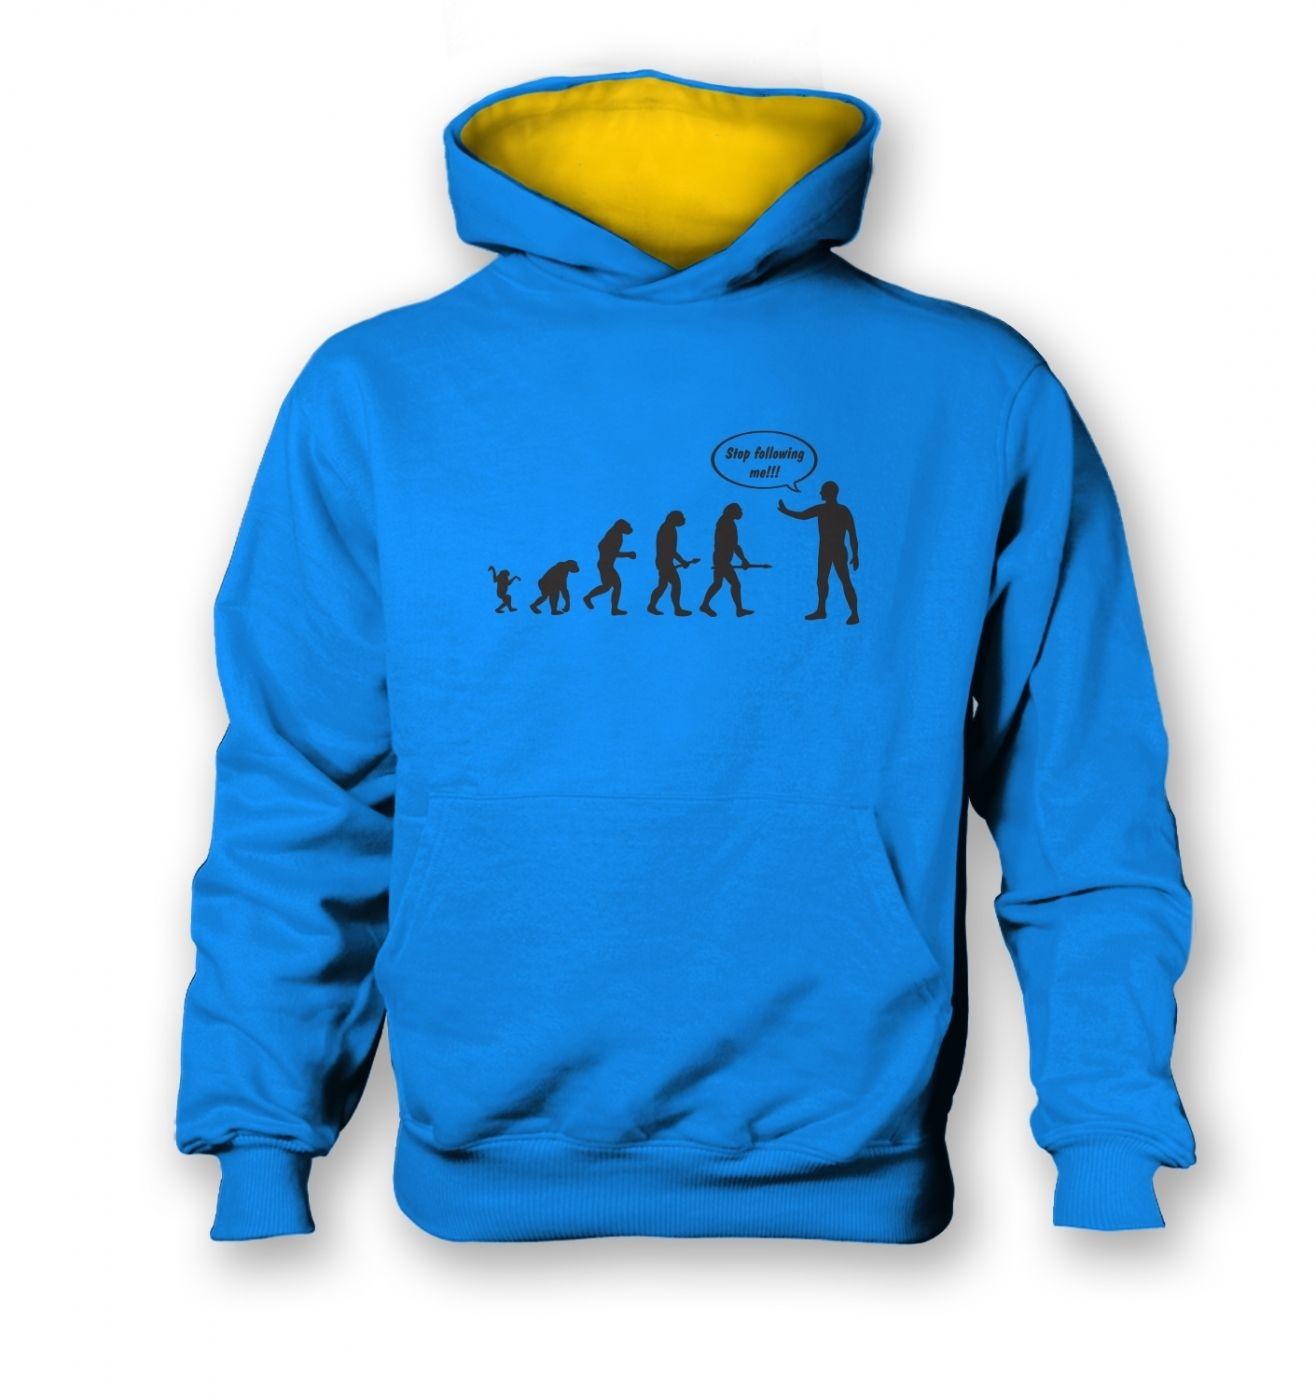 Stop following me! evolution kids contrast hoodie